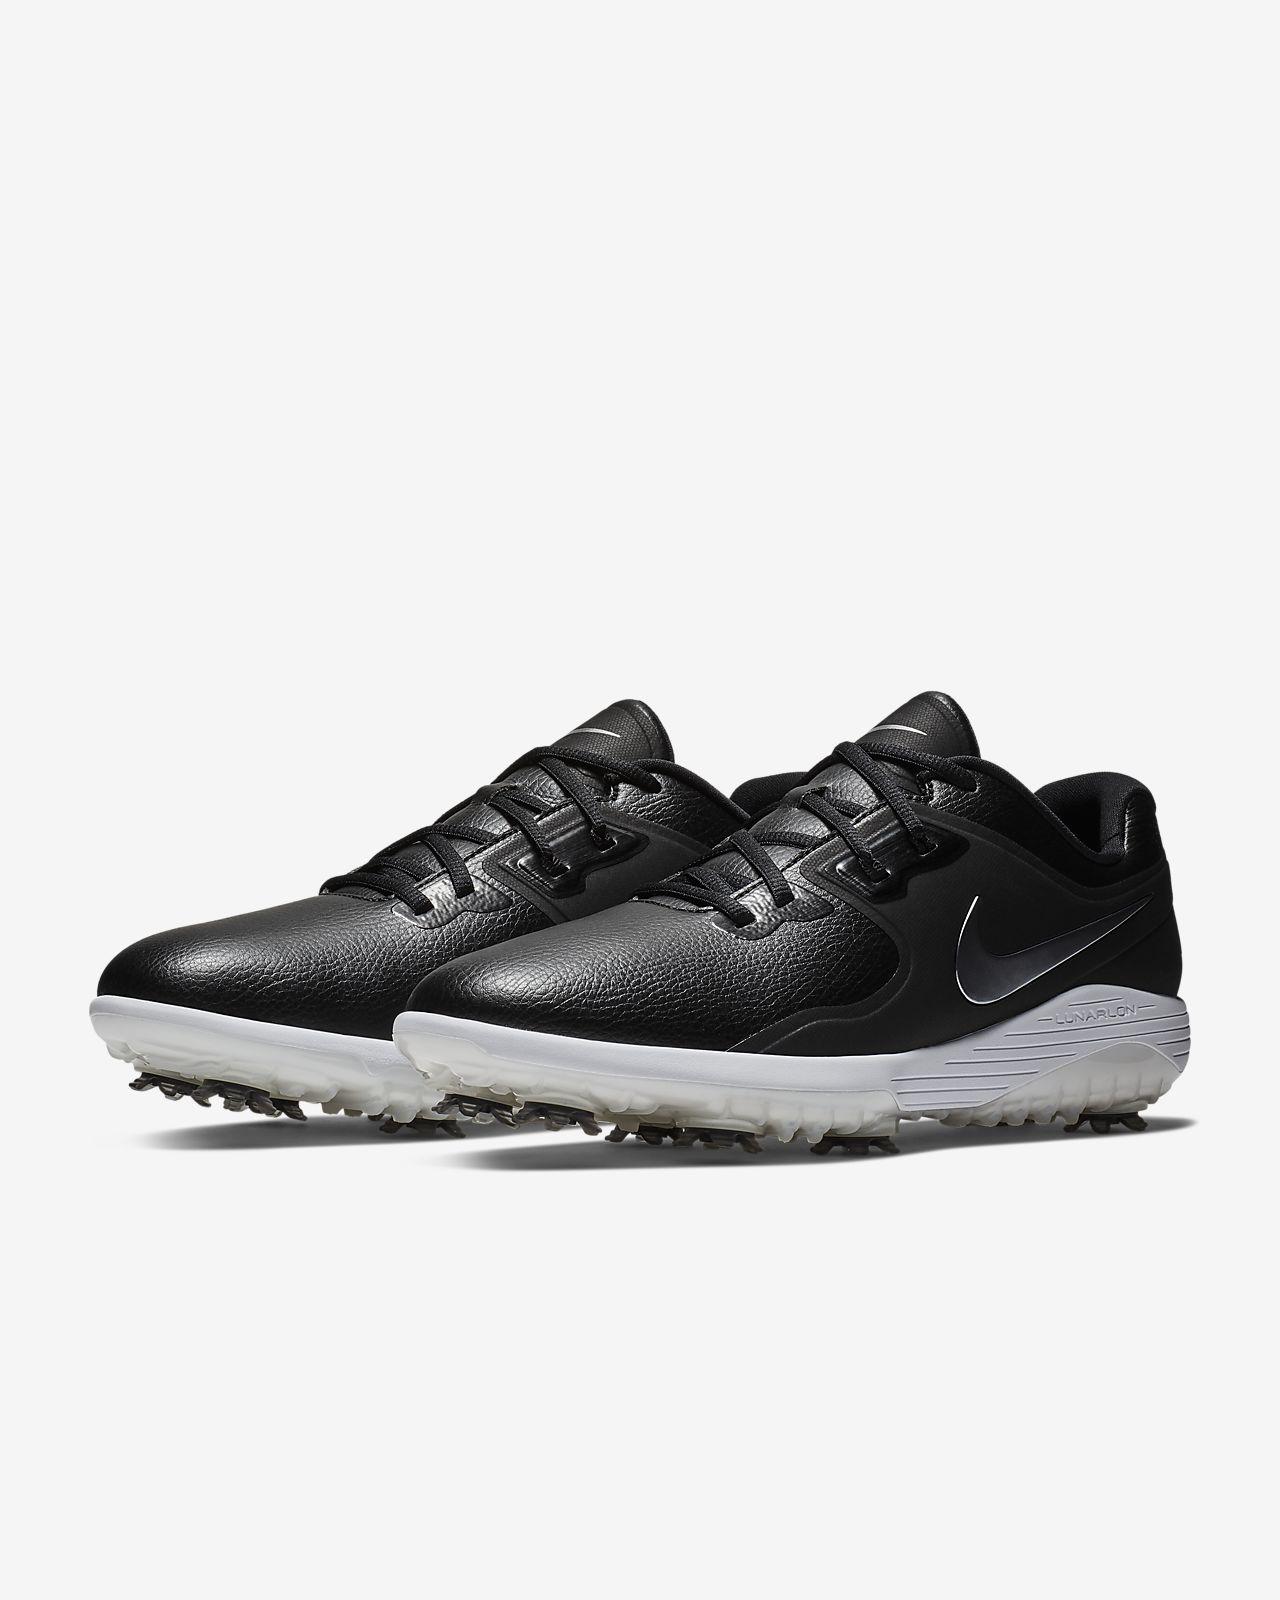 the latest 2042e f7acd ... Męskie buty do golfa Nike Vapor Pro